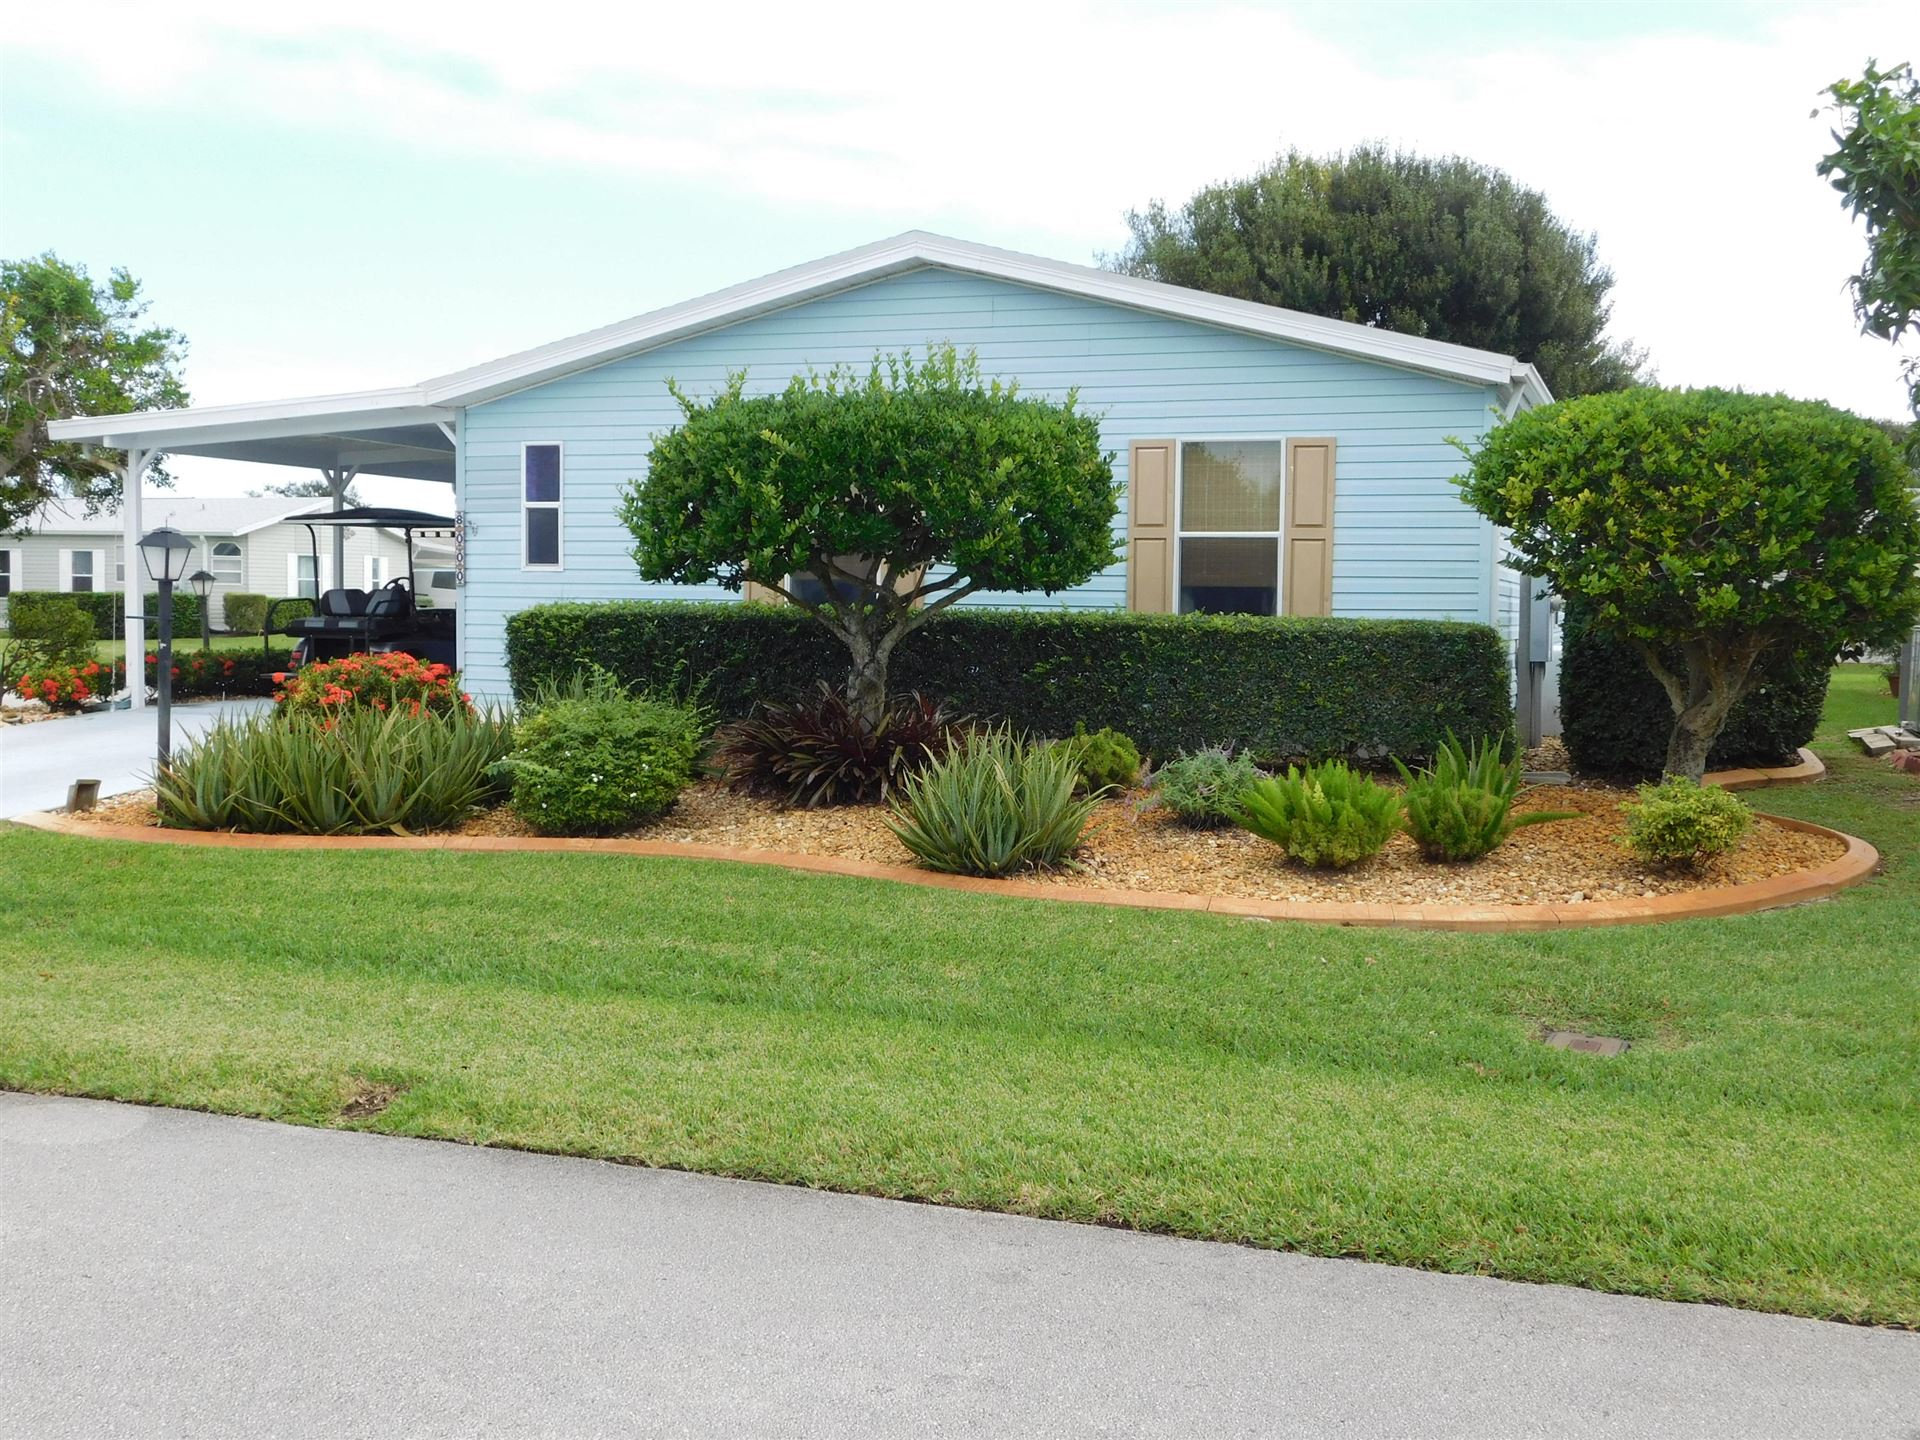 8000 Meadowlark Lane, Port Saint Lucie, FL 34952 - #: RX-10673694